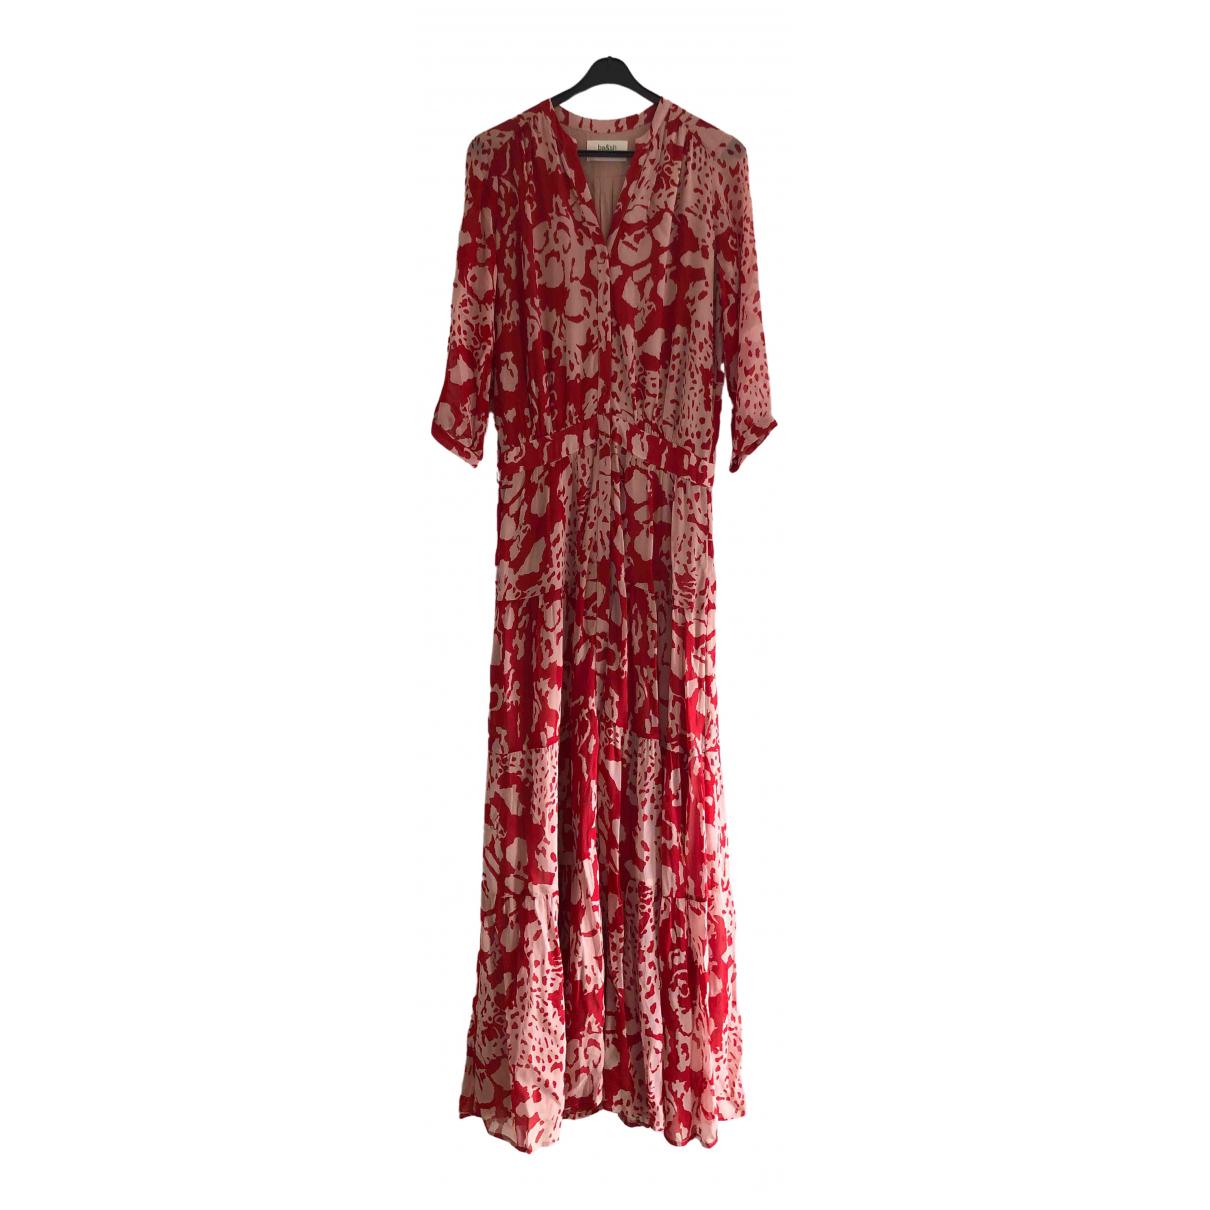 Ba&sh - Robe Spring Summer 2019 pour femme - rouge